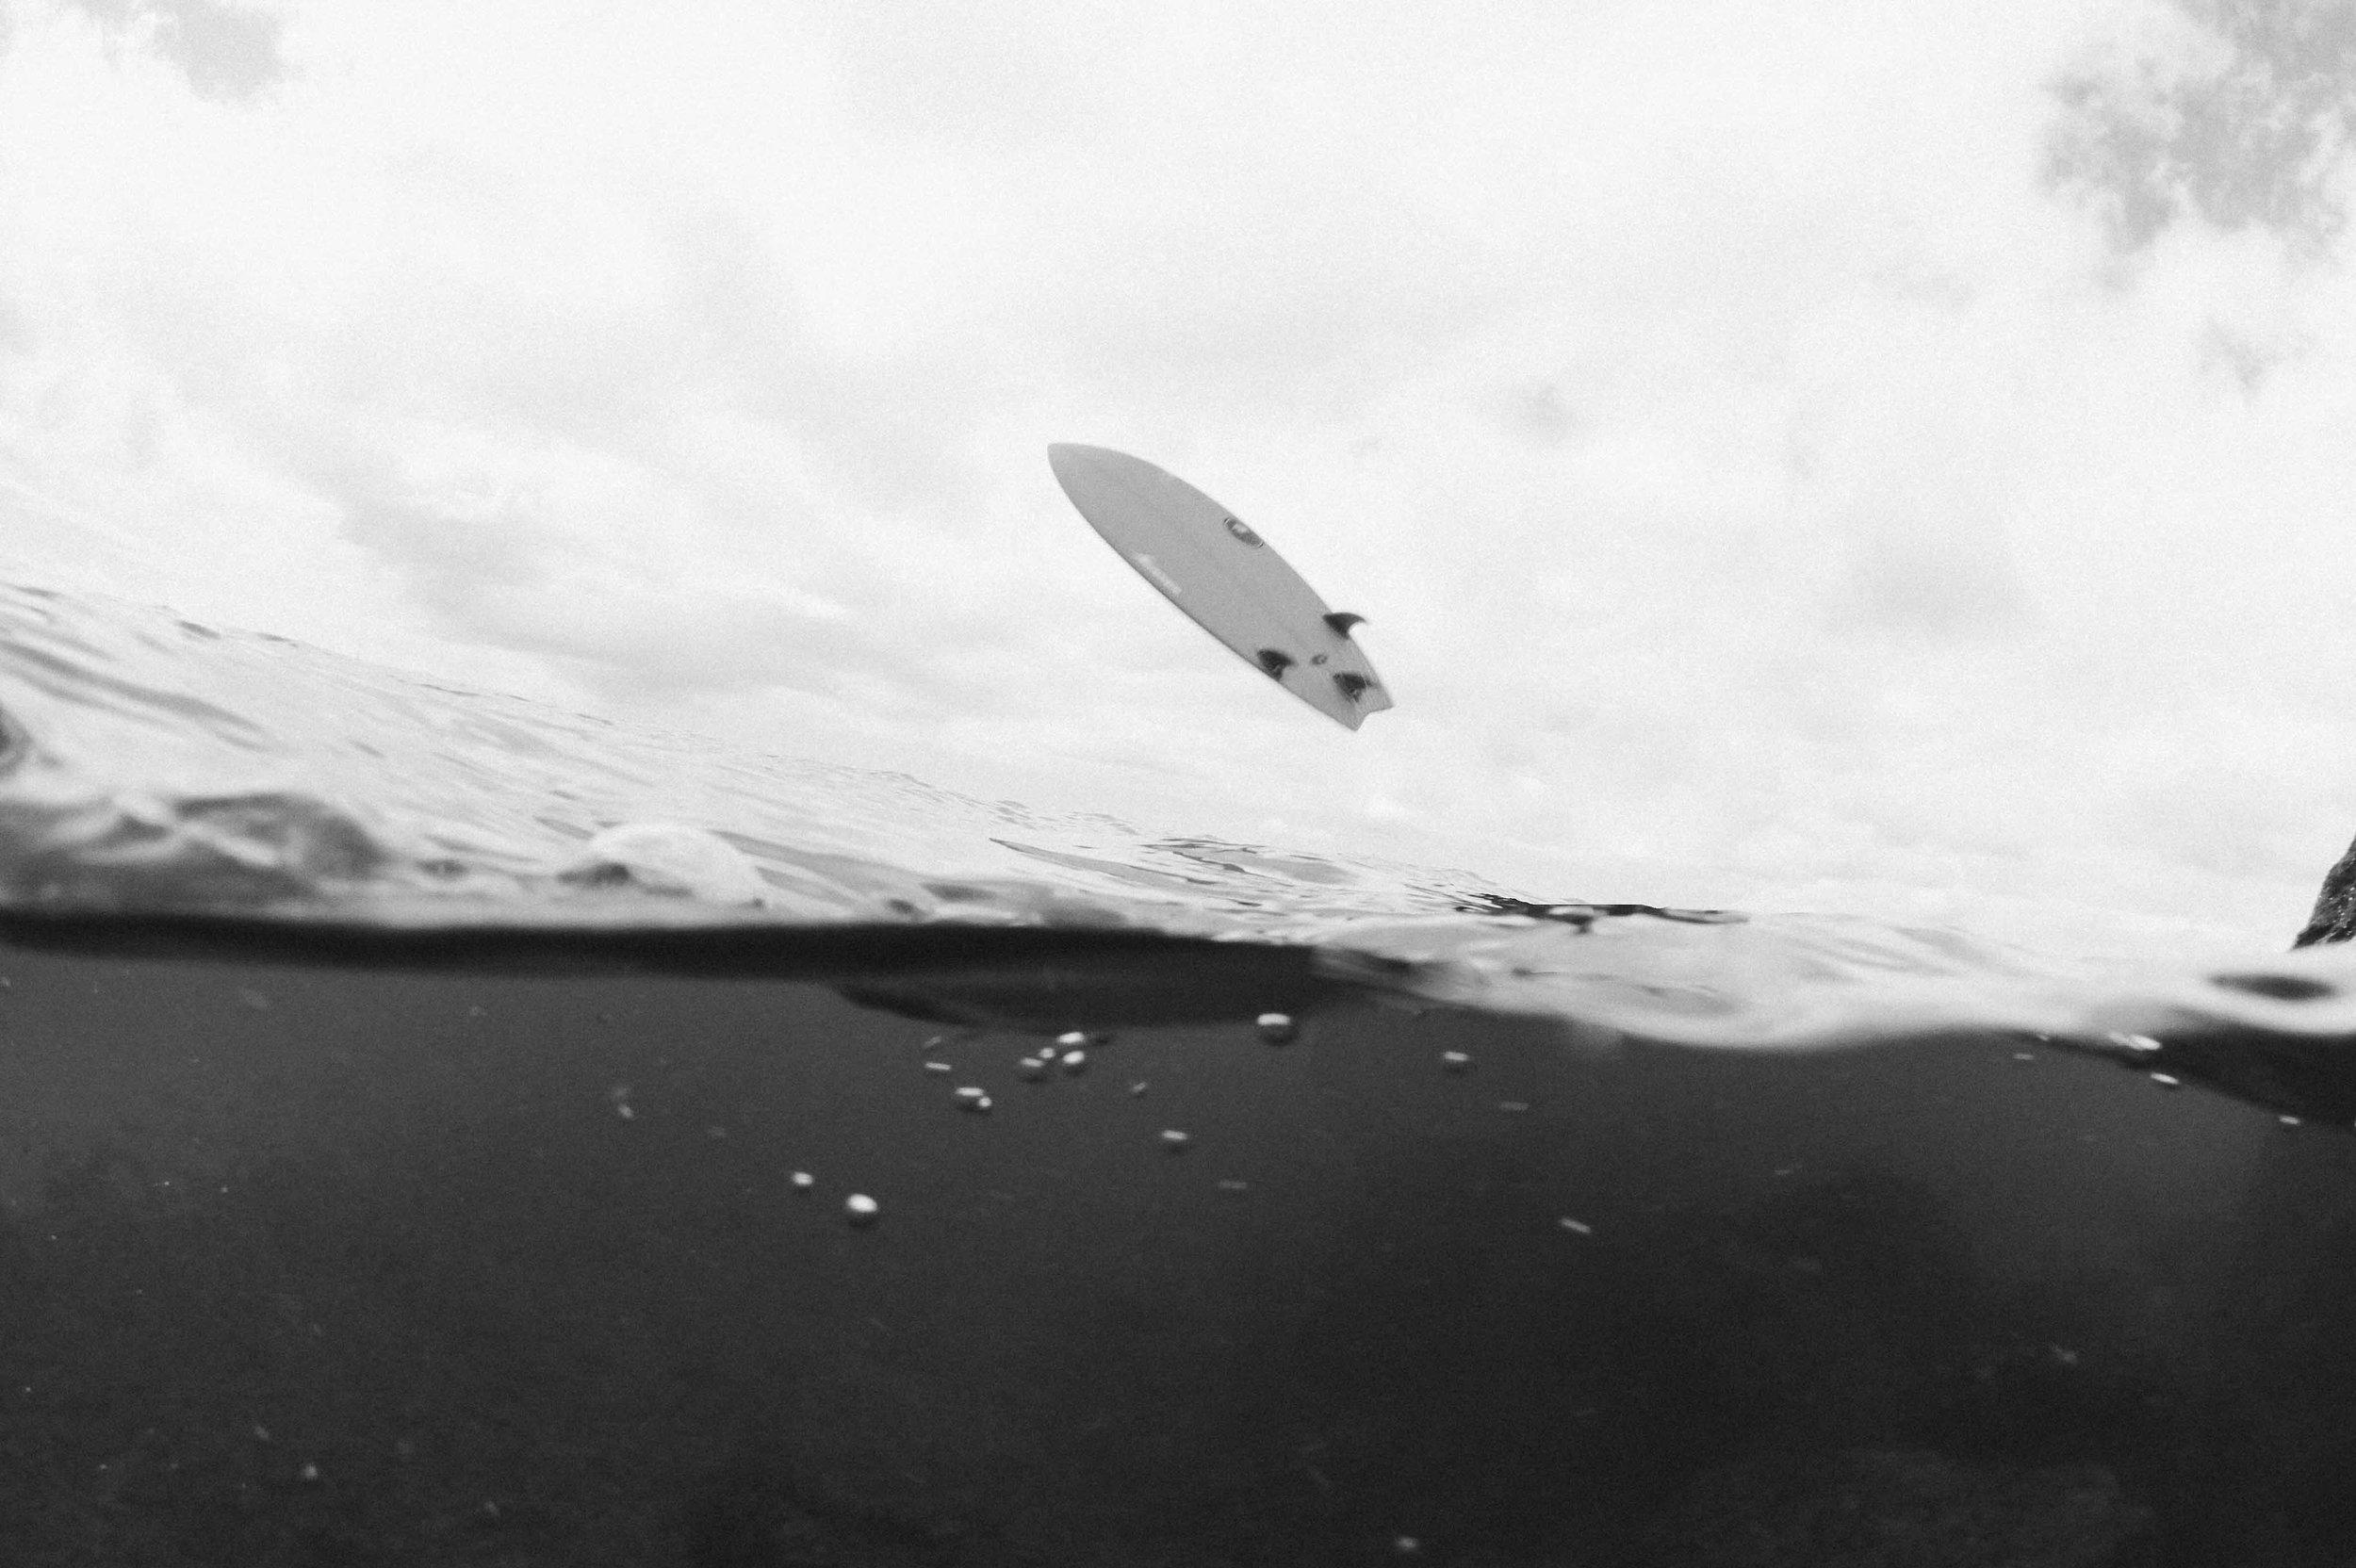 surf-board-ocean-black-white